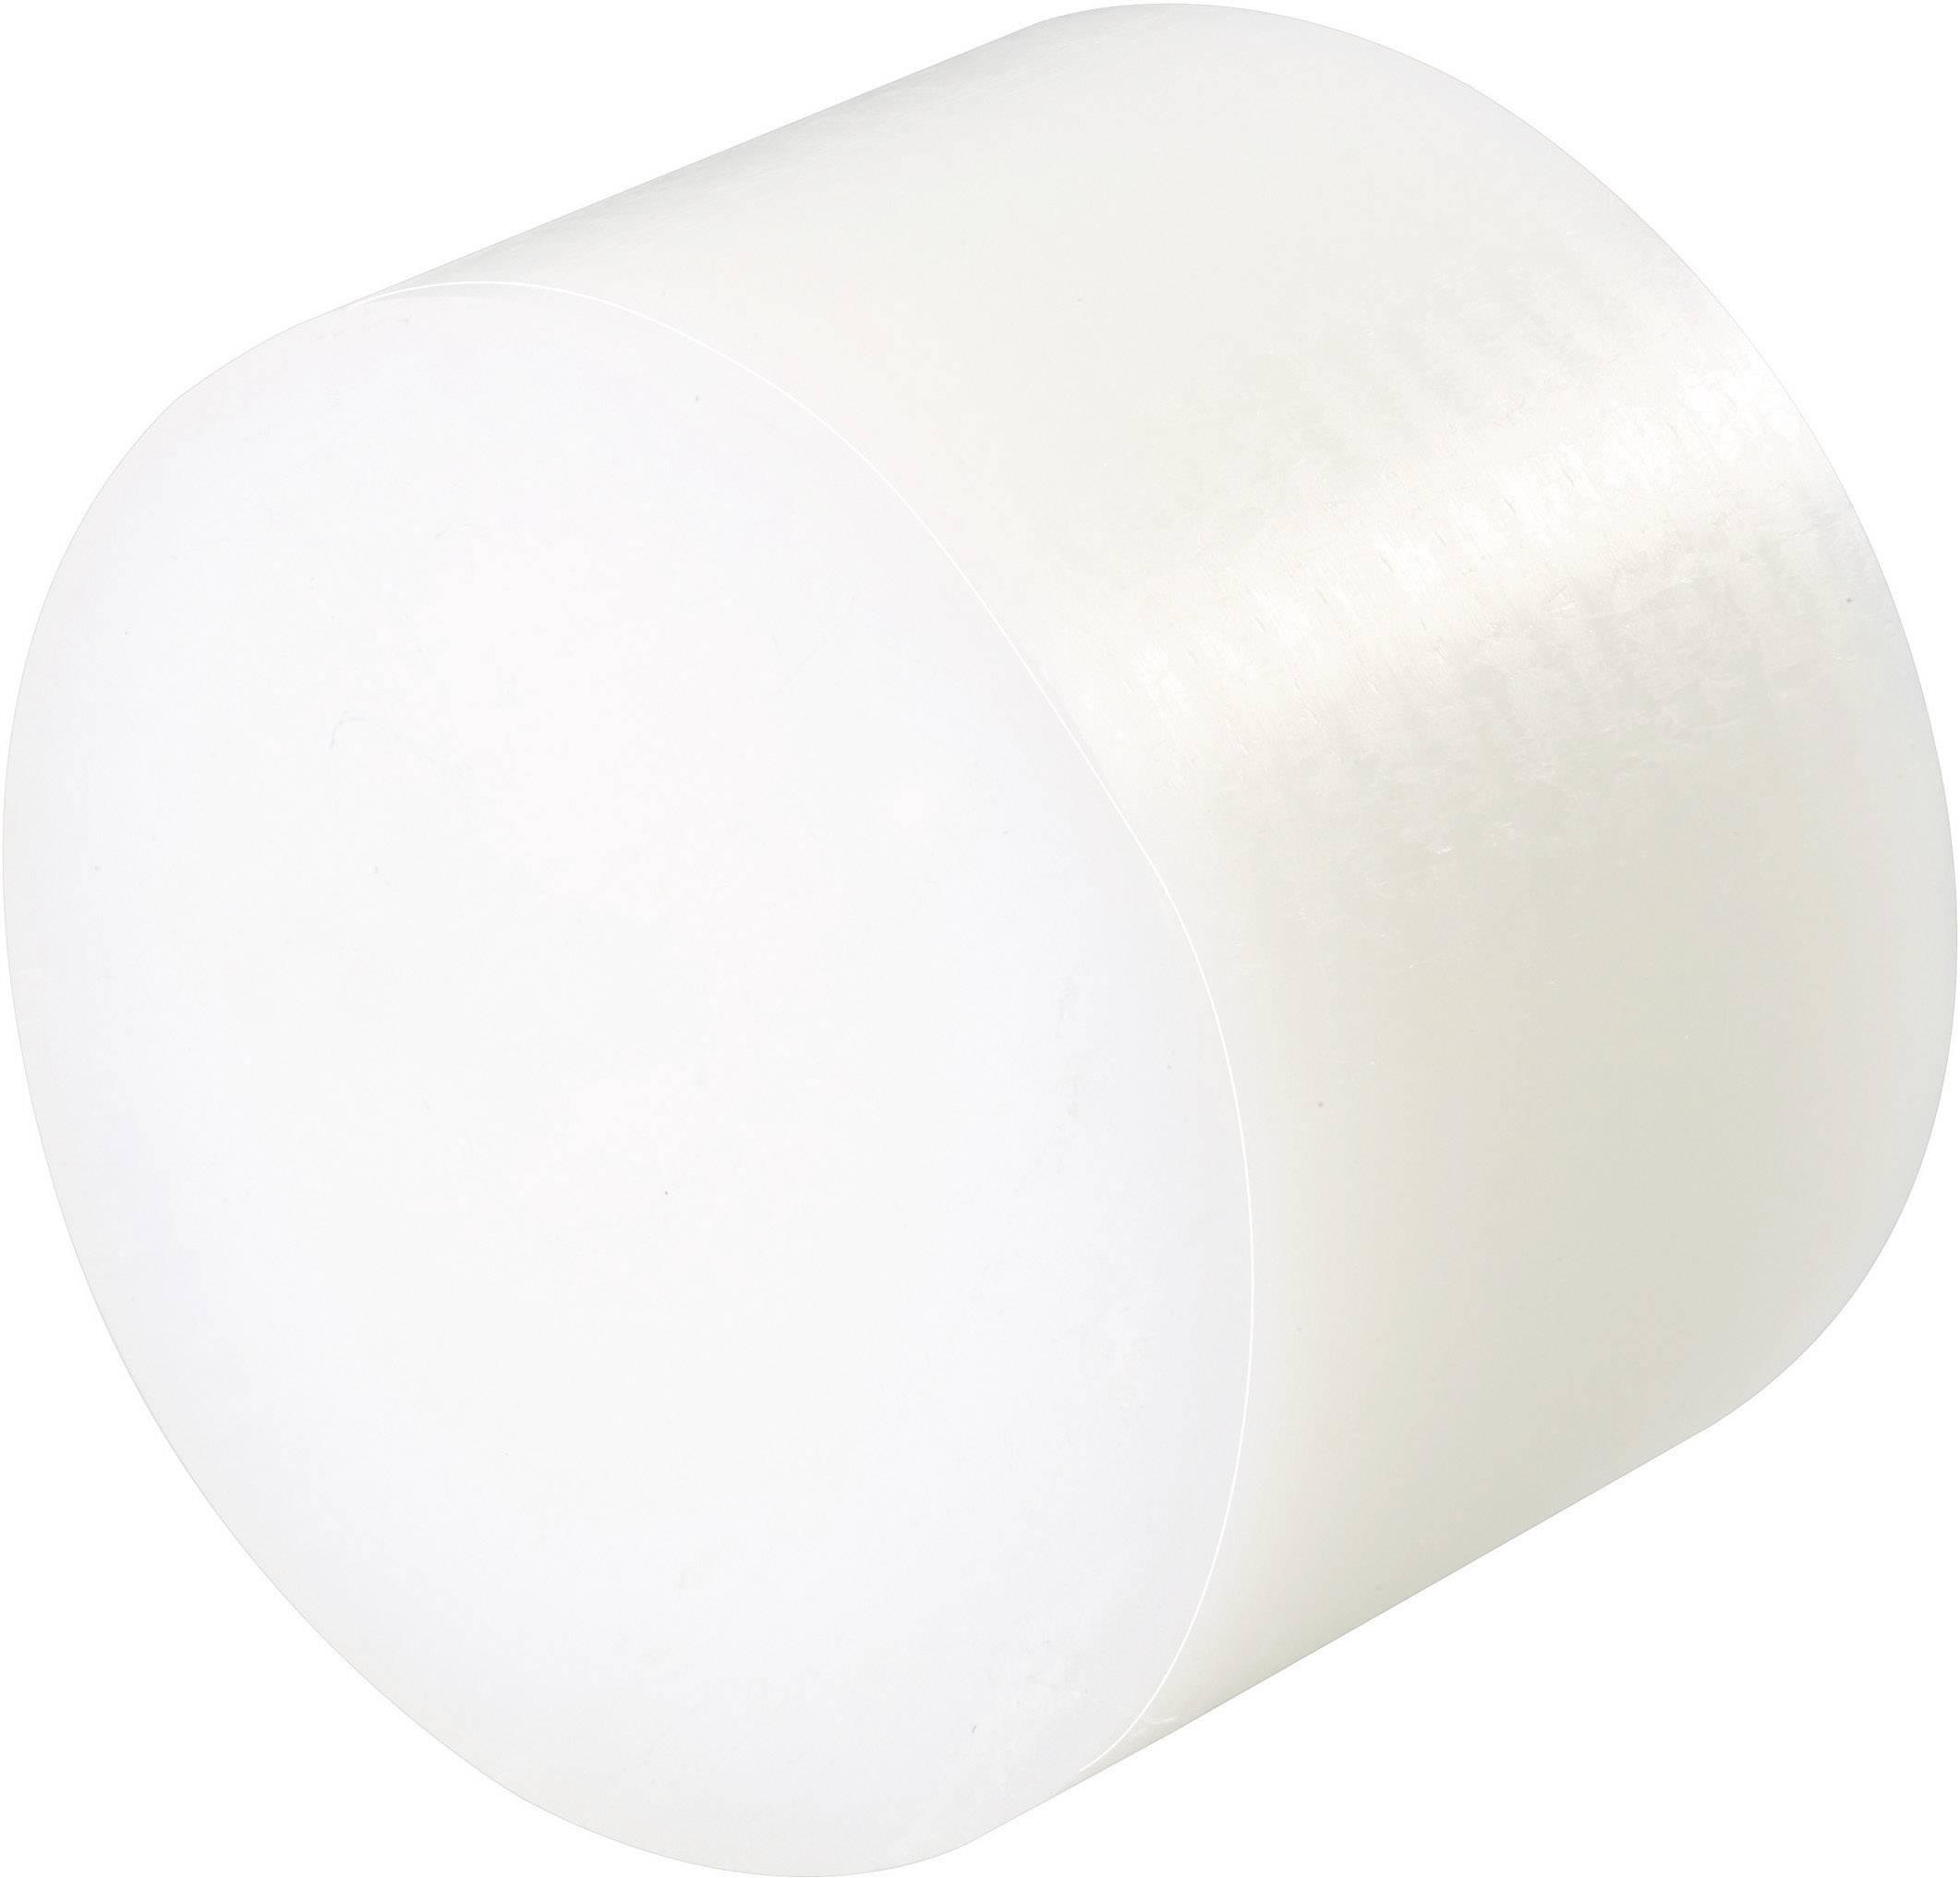 Tyčový profil, (Ø x d) 80 mm x 60 mm, polyamid